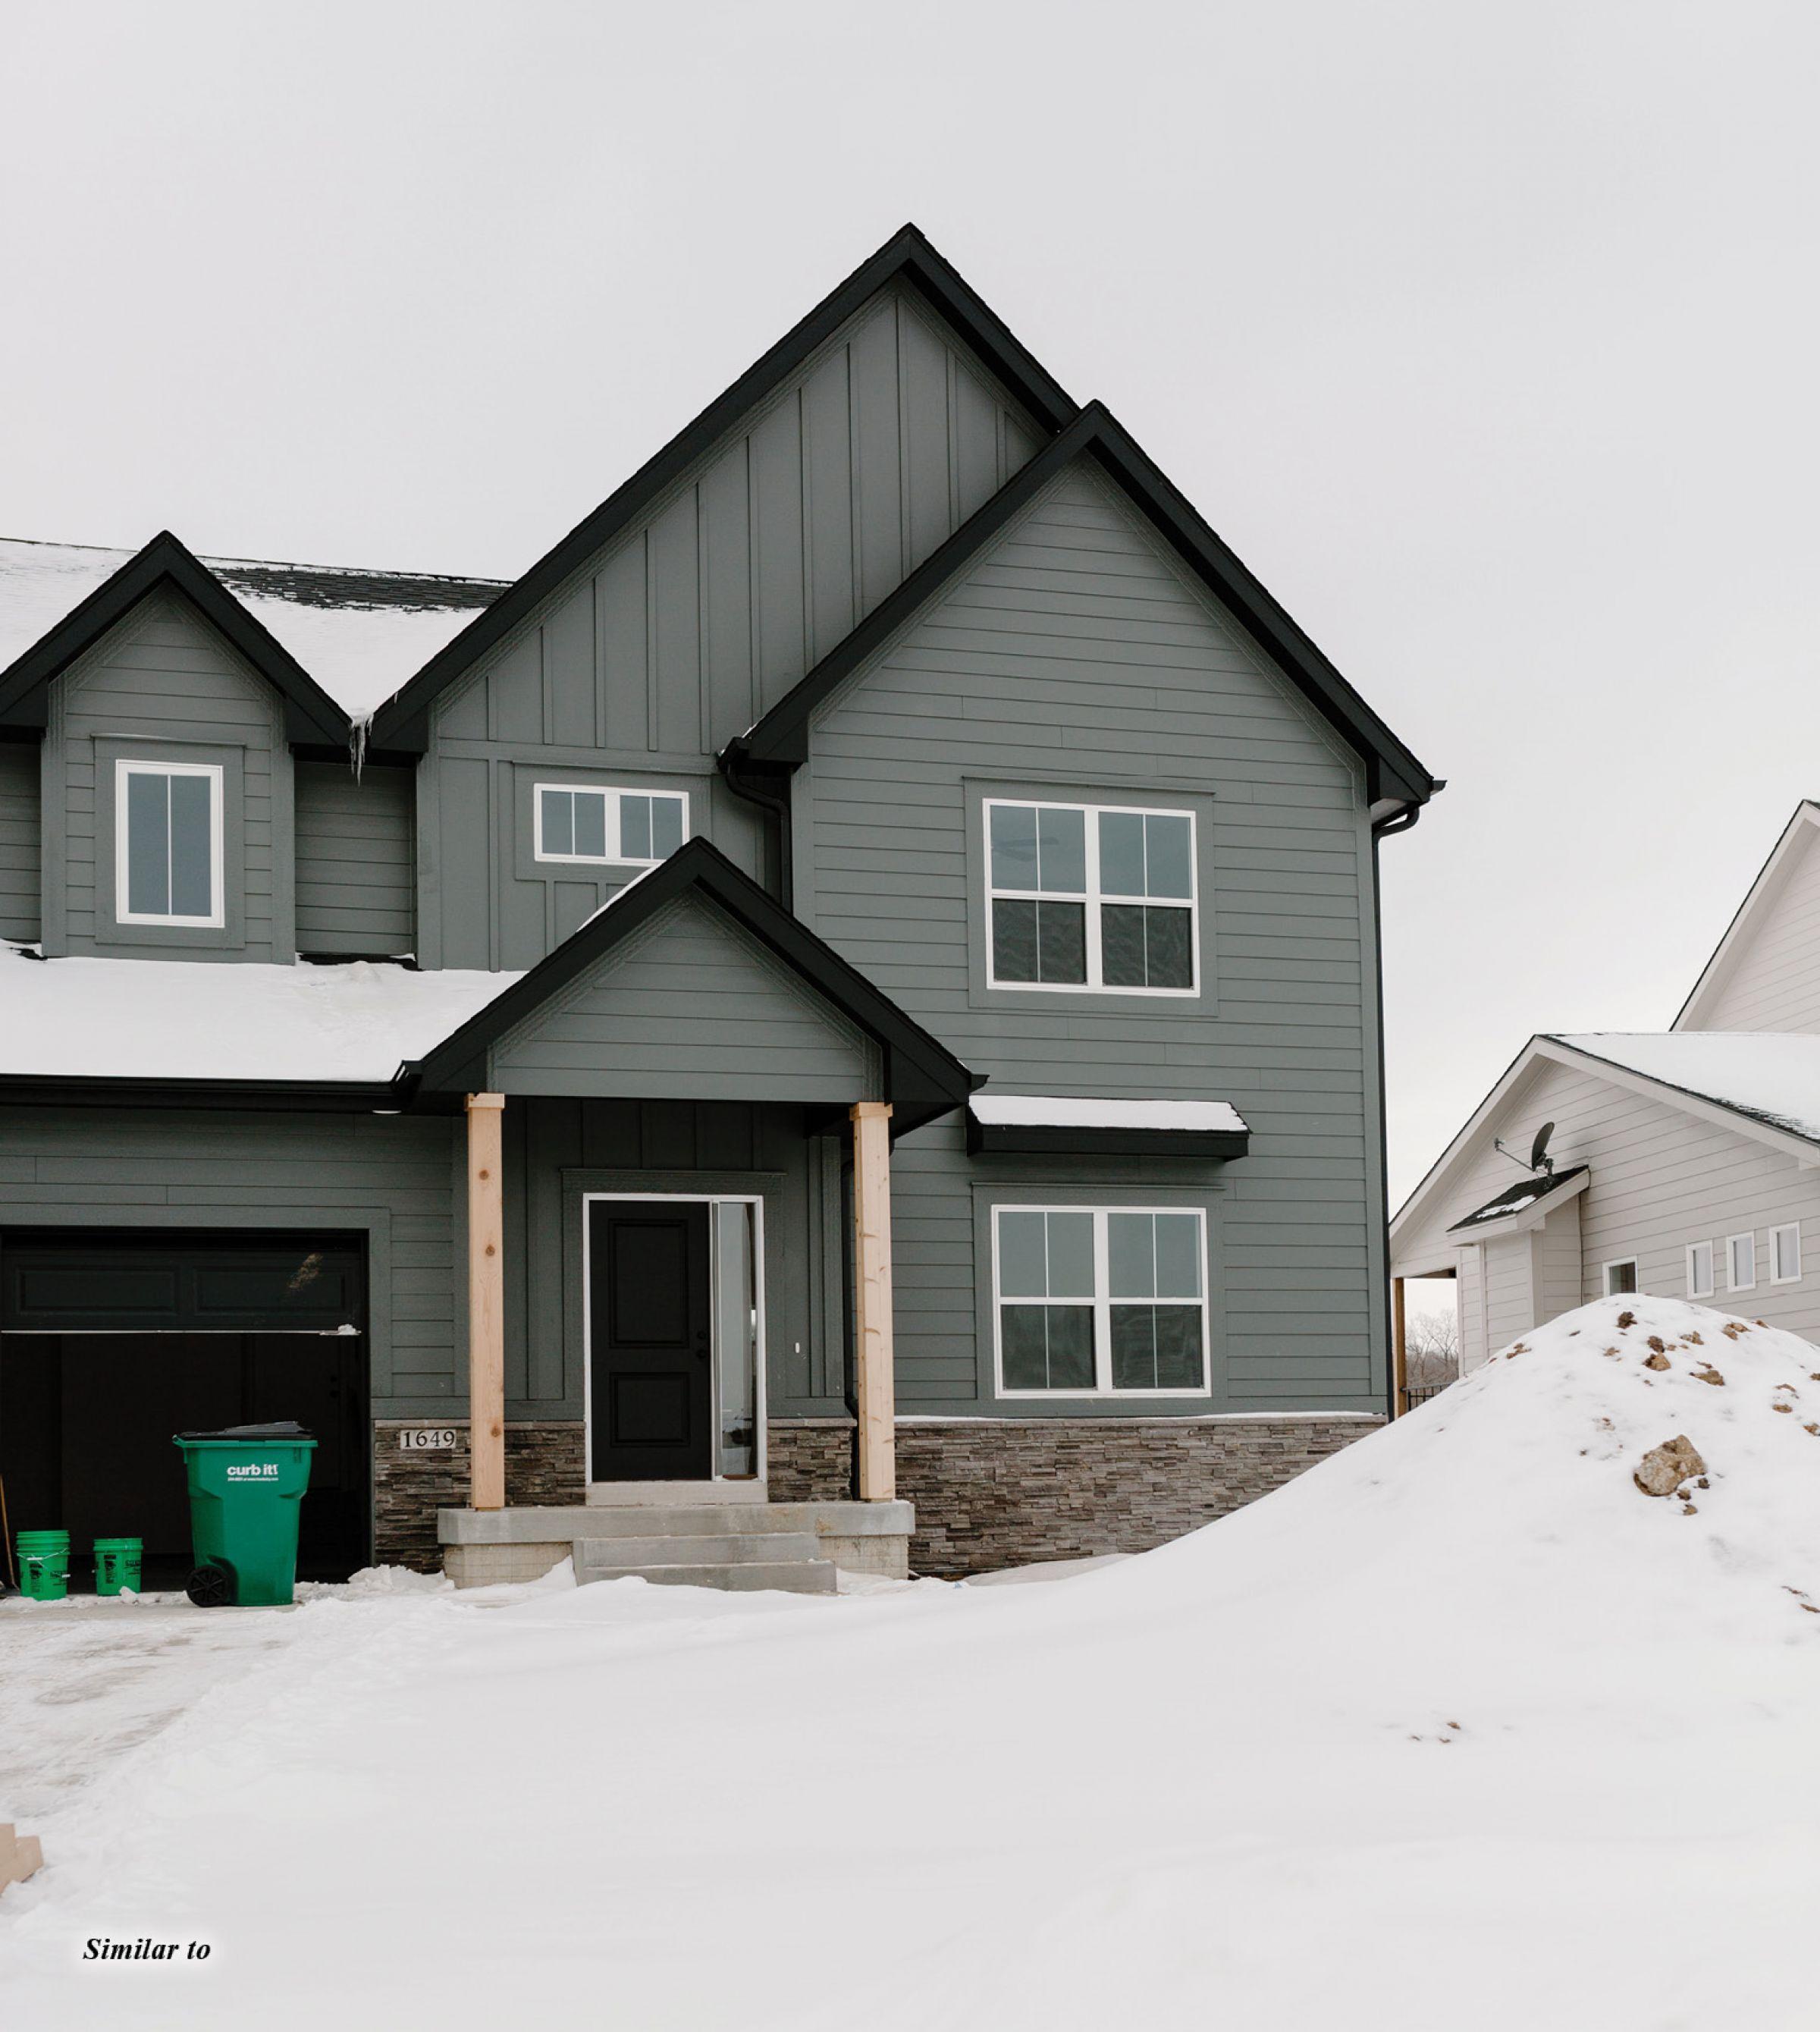 residential-polk-county-iowa-0-acres-listing-number-15443-14-2021-04-02-195836.jpg